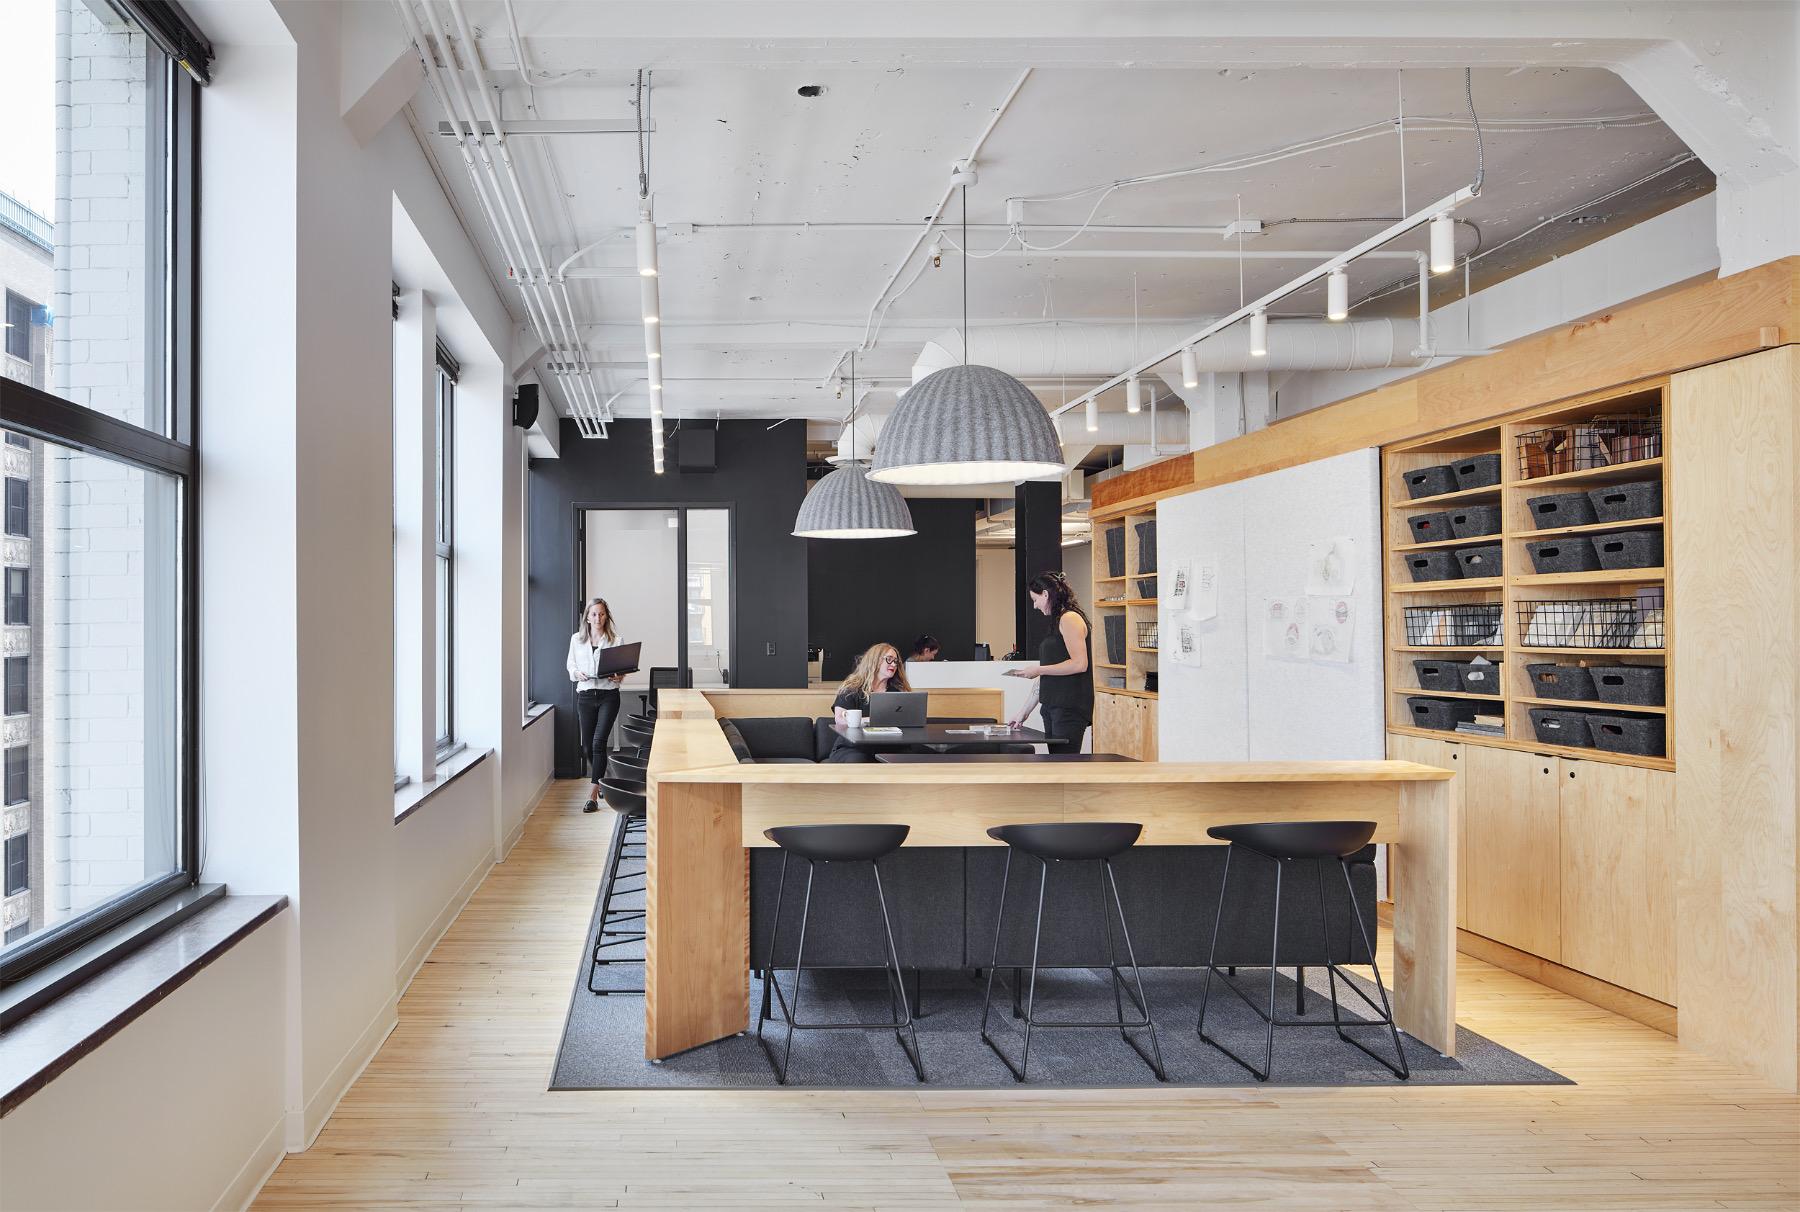 damon-farber-office-1